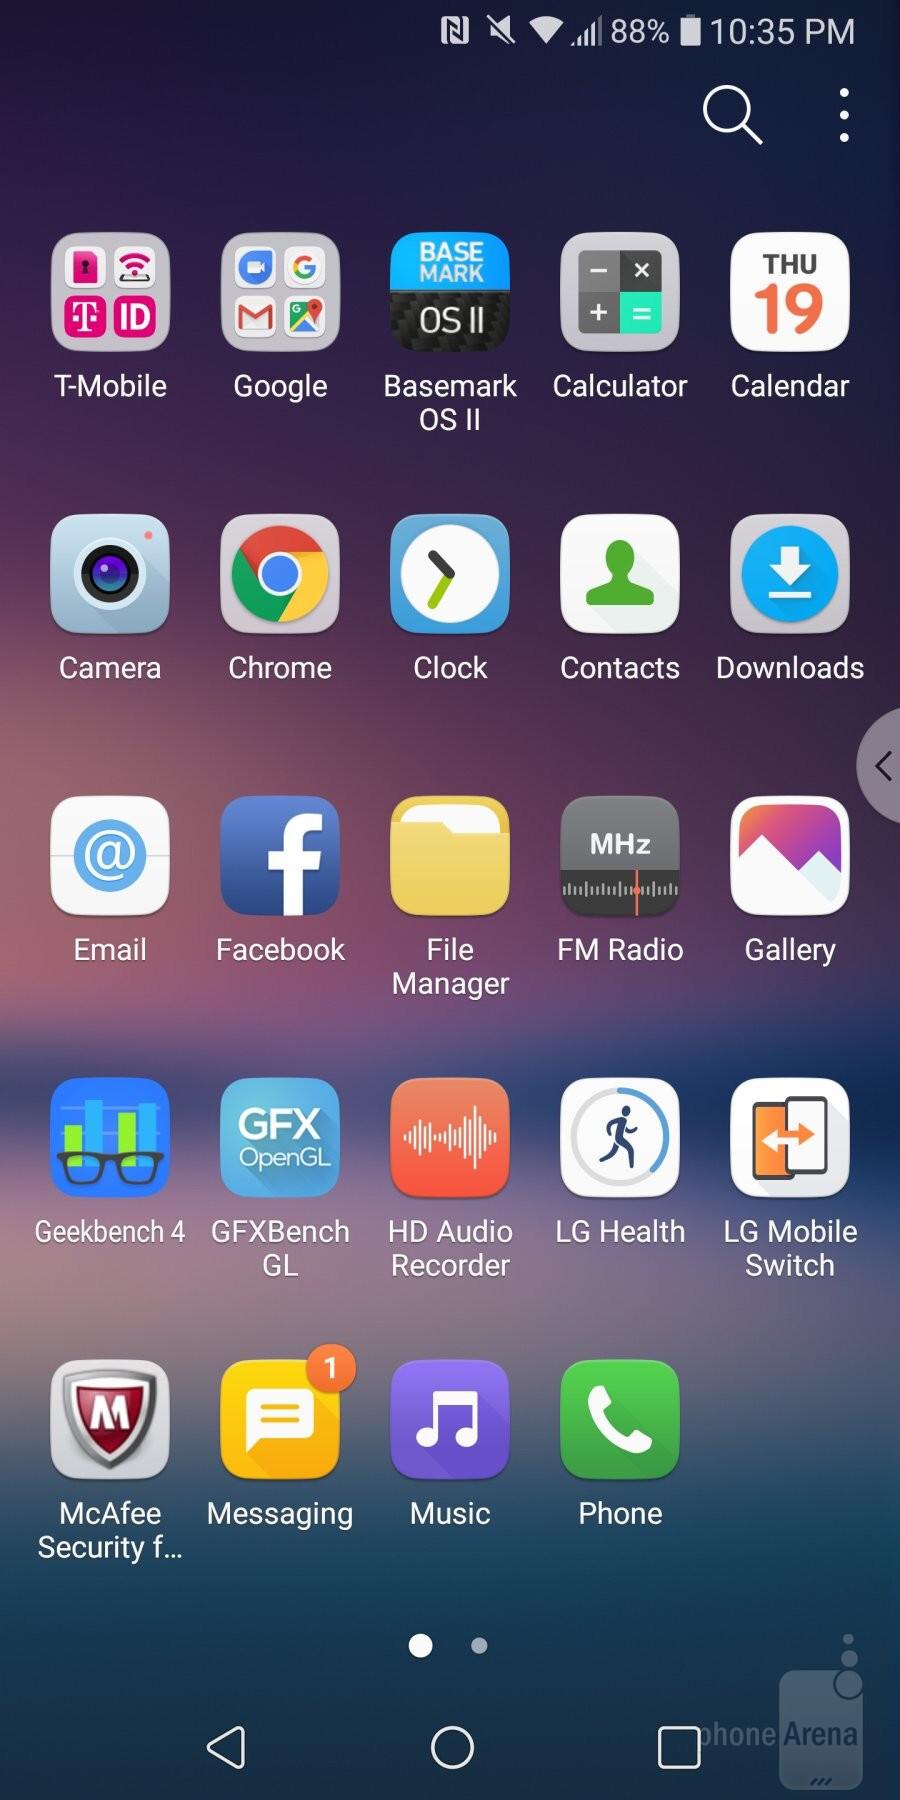 UI on the LG V30 - Samsung Galaxy S9+ vs LG V30